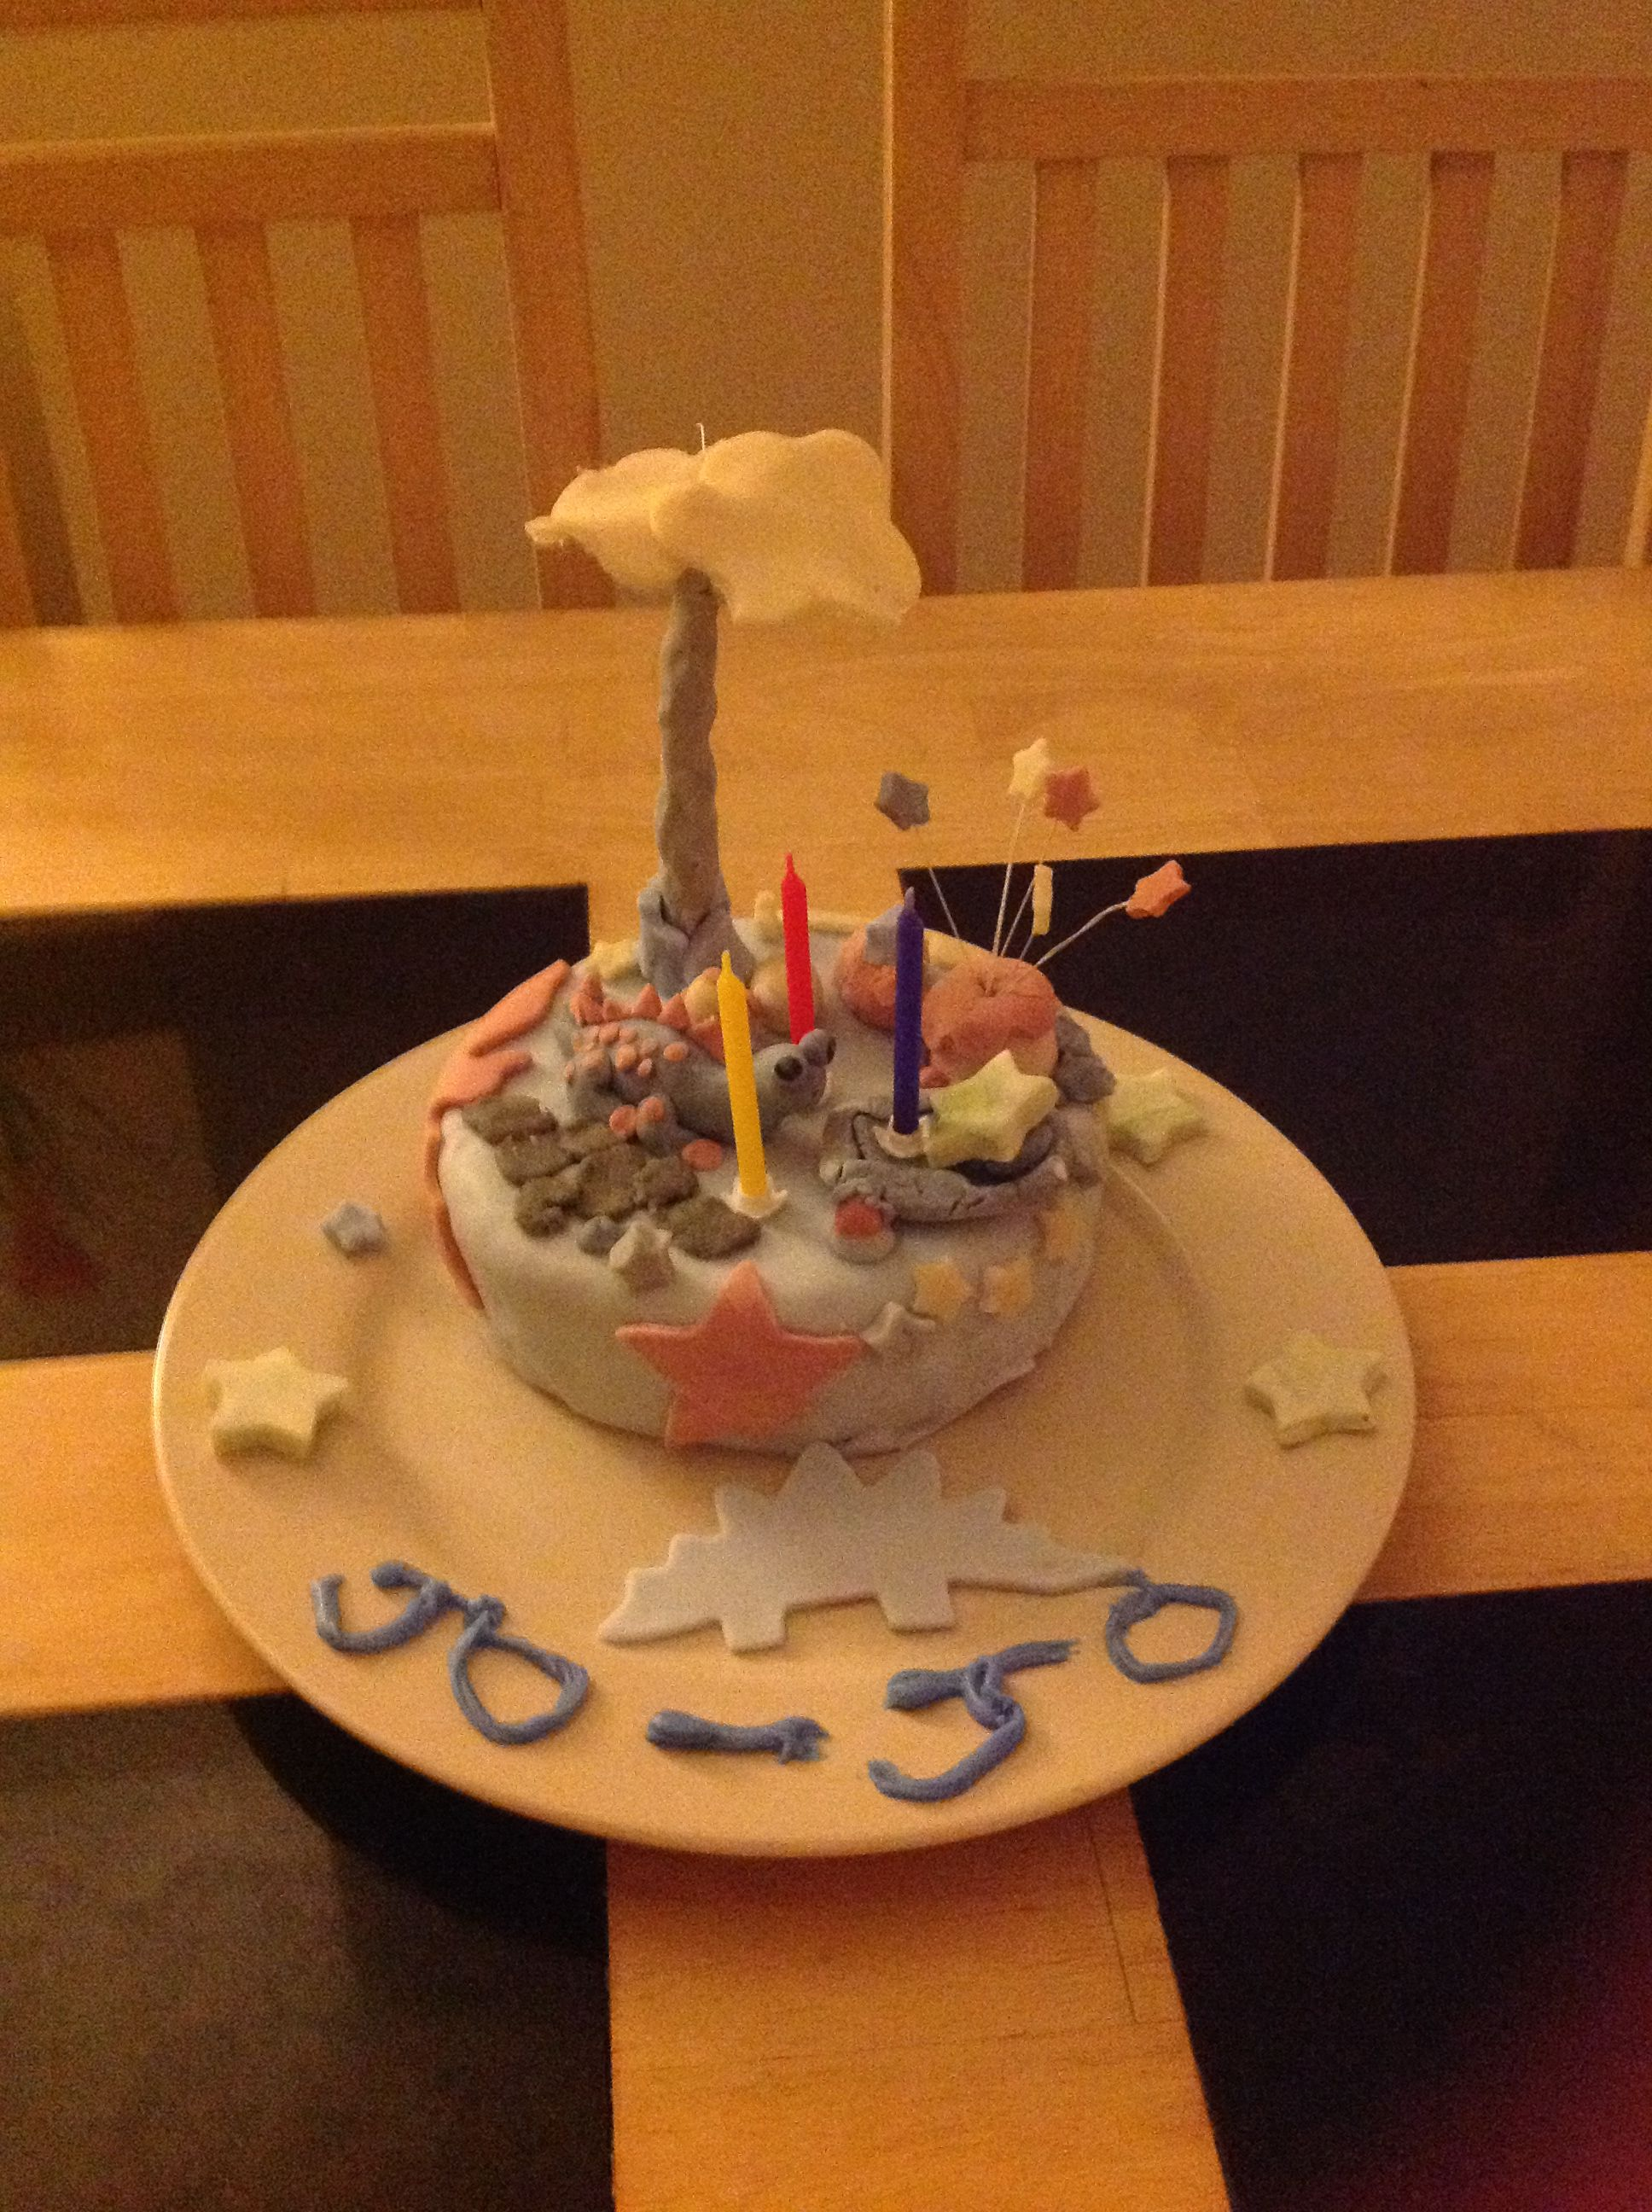 My son first handmade cake :) mummy so proud xxxx